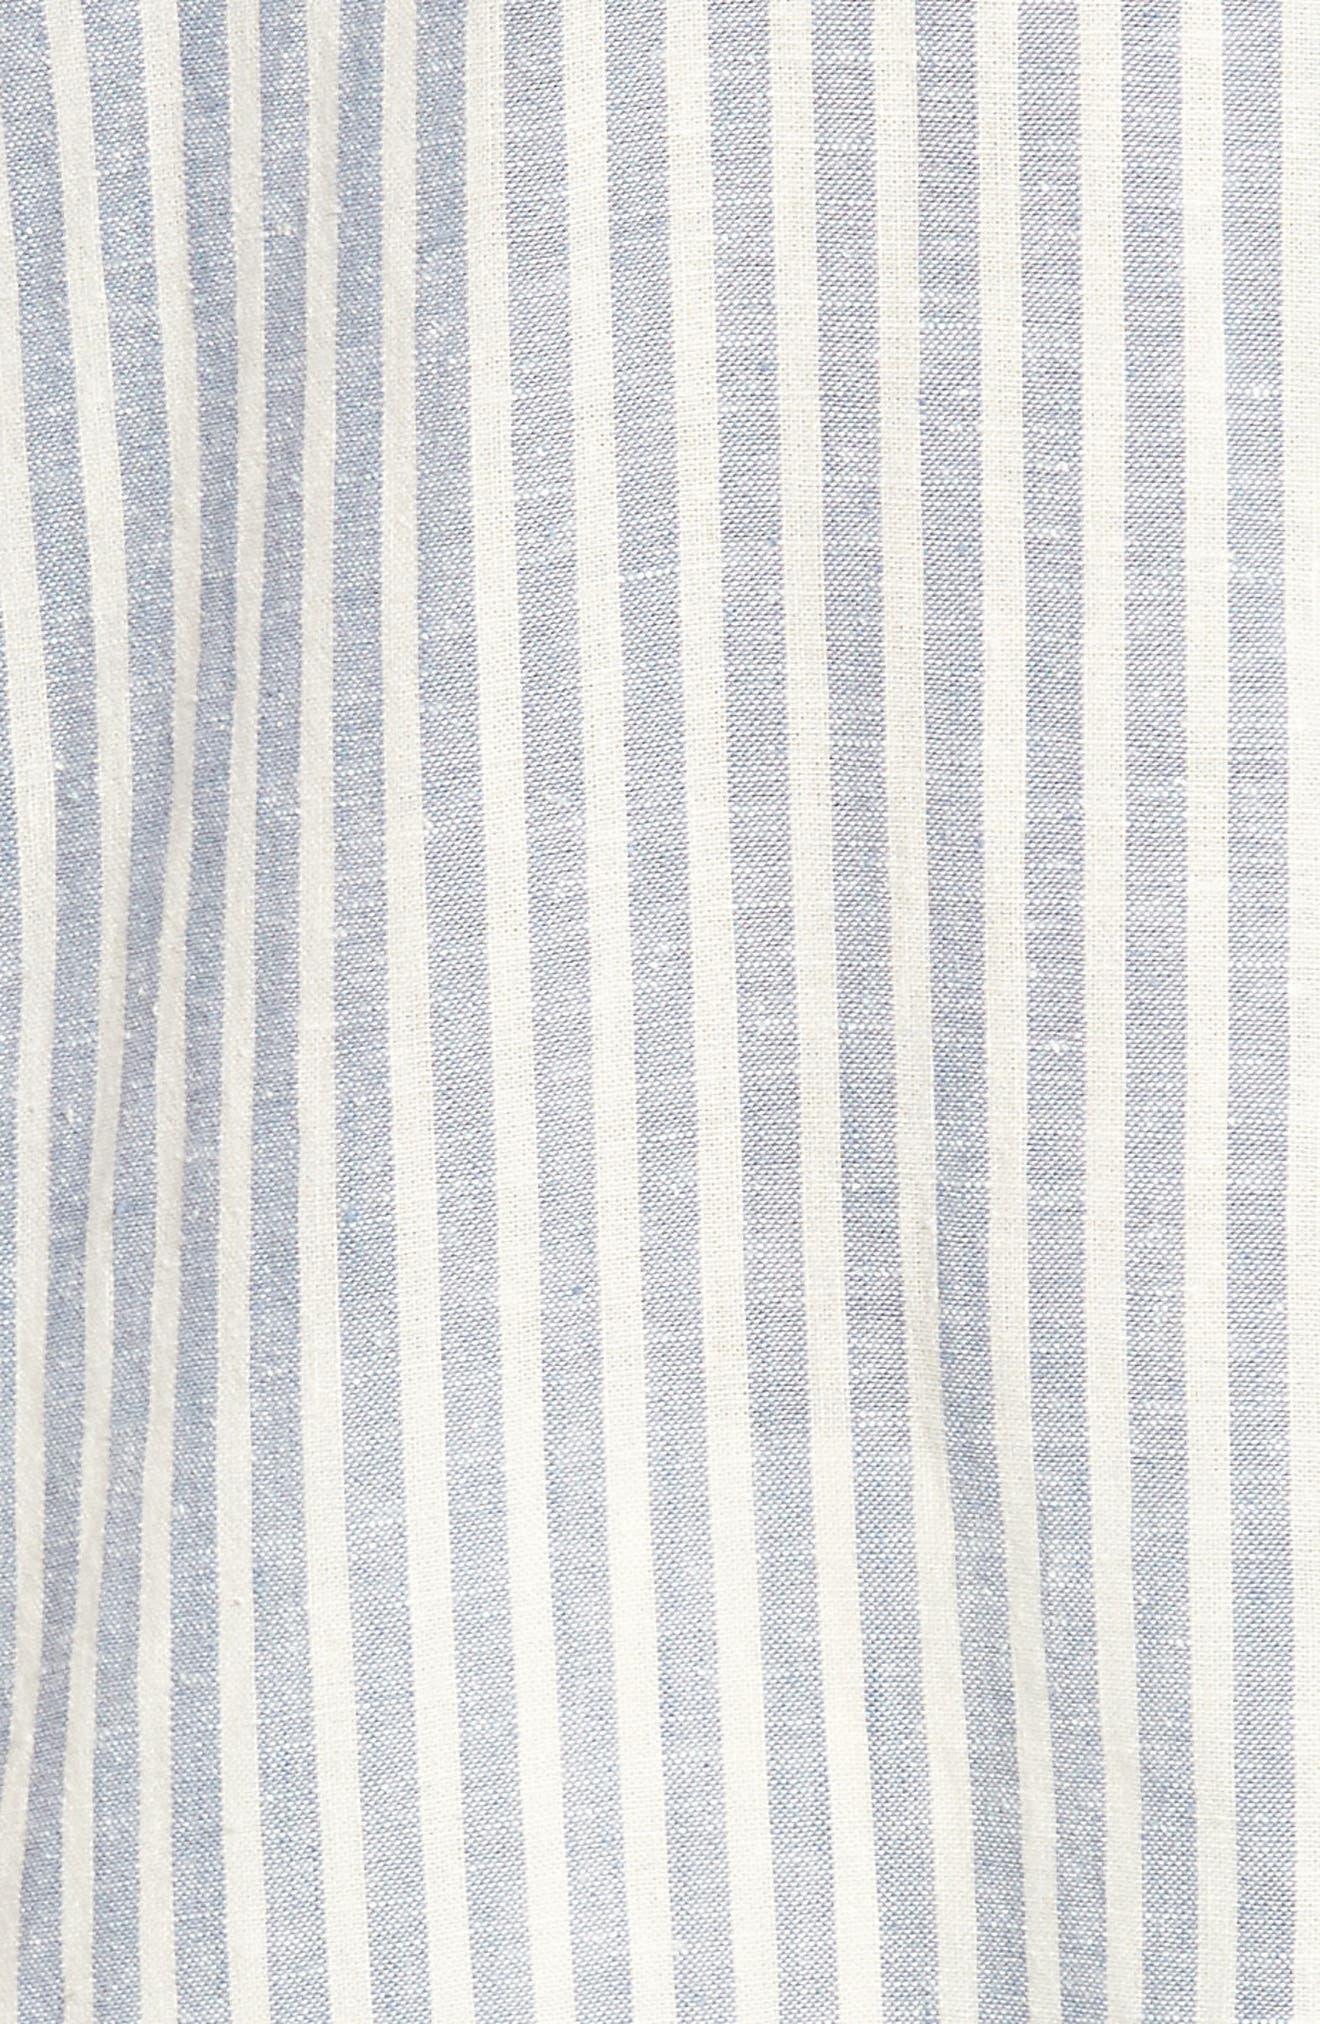 Stripe Tunic Top,                             Alternate thumbnail 11, color,